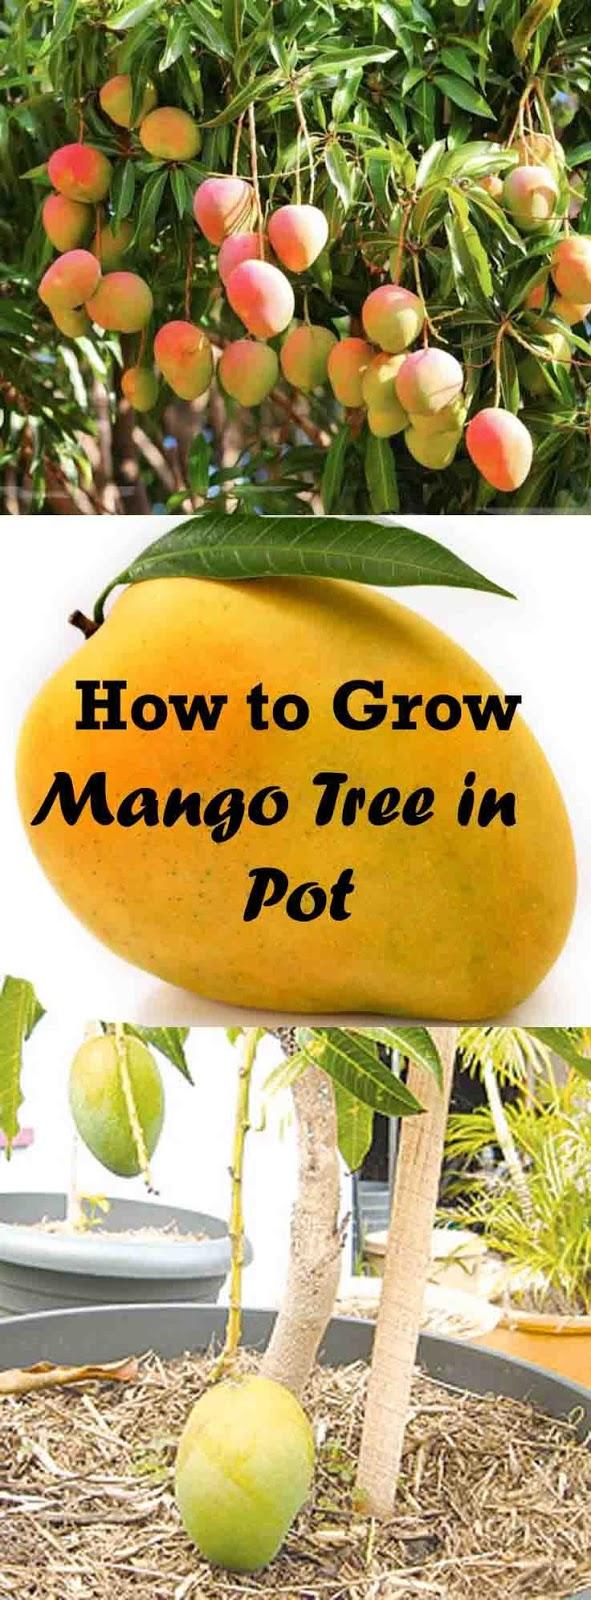 Flowers Gardens How To Grow Mango Tree In Pot